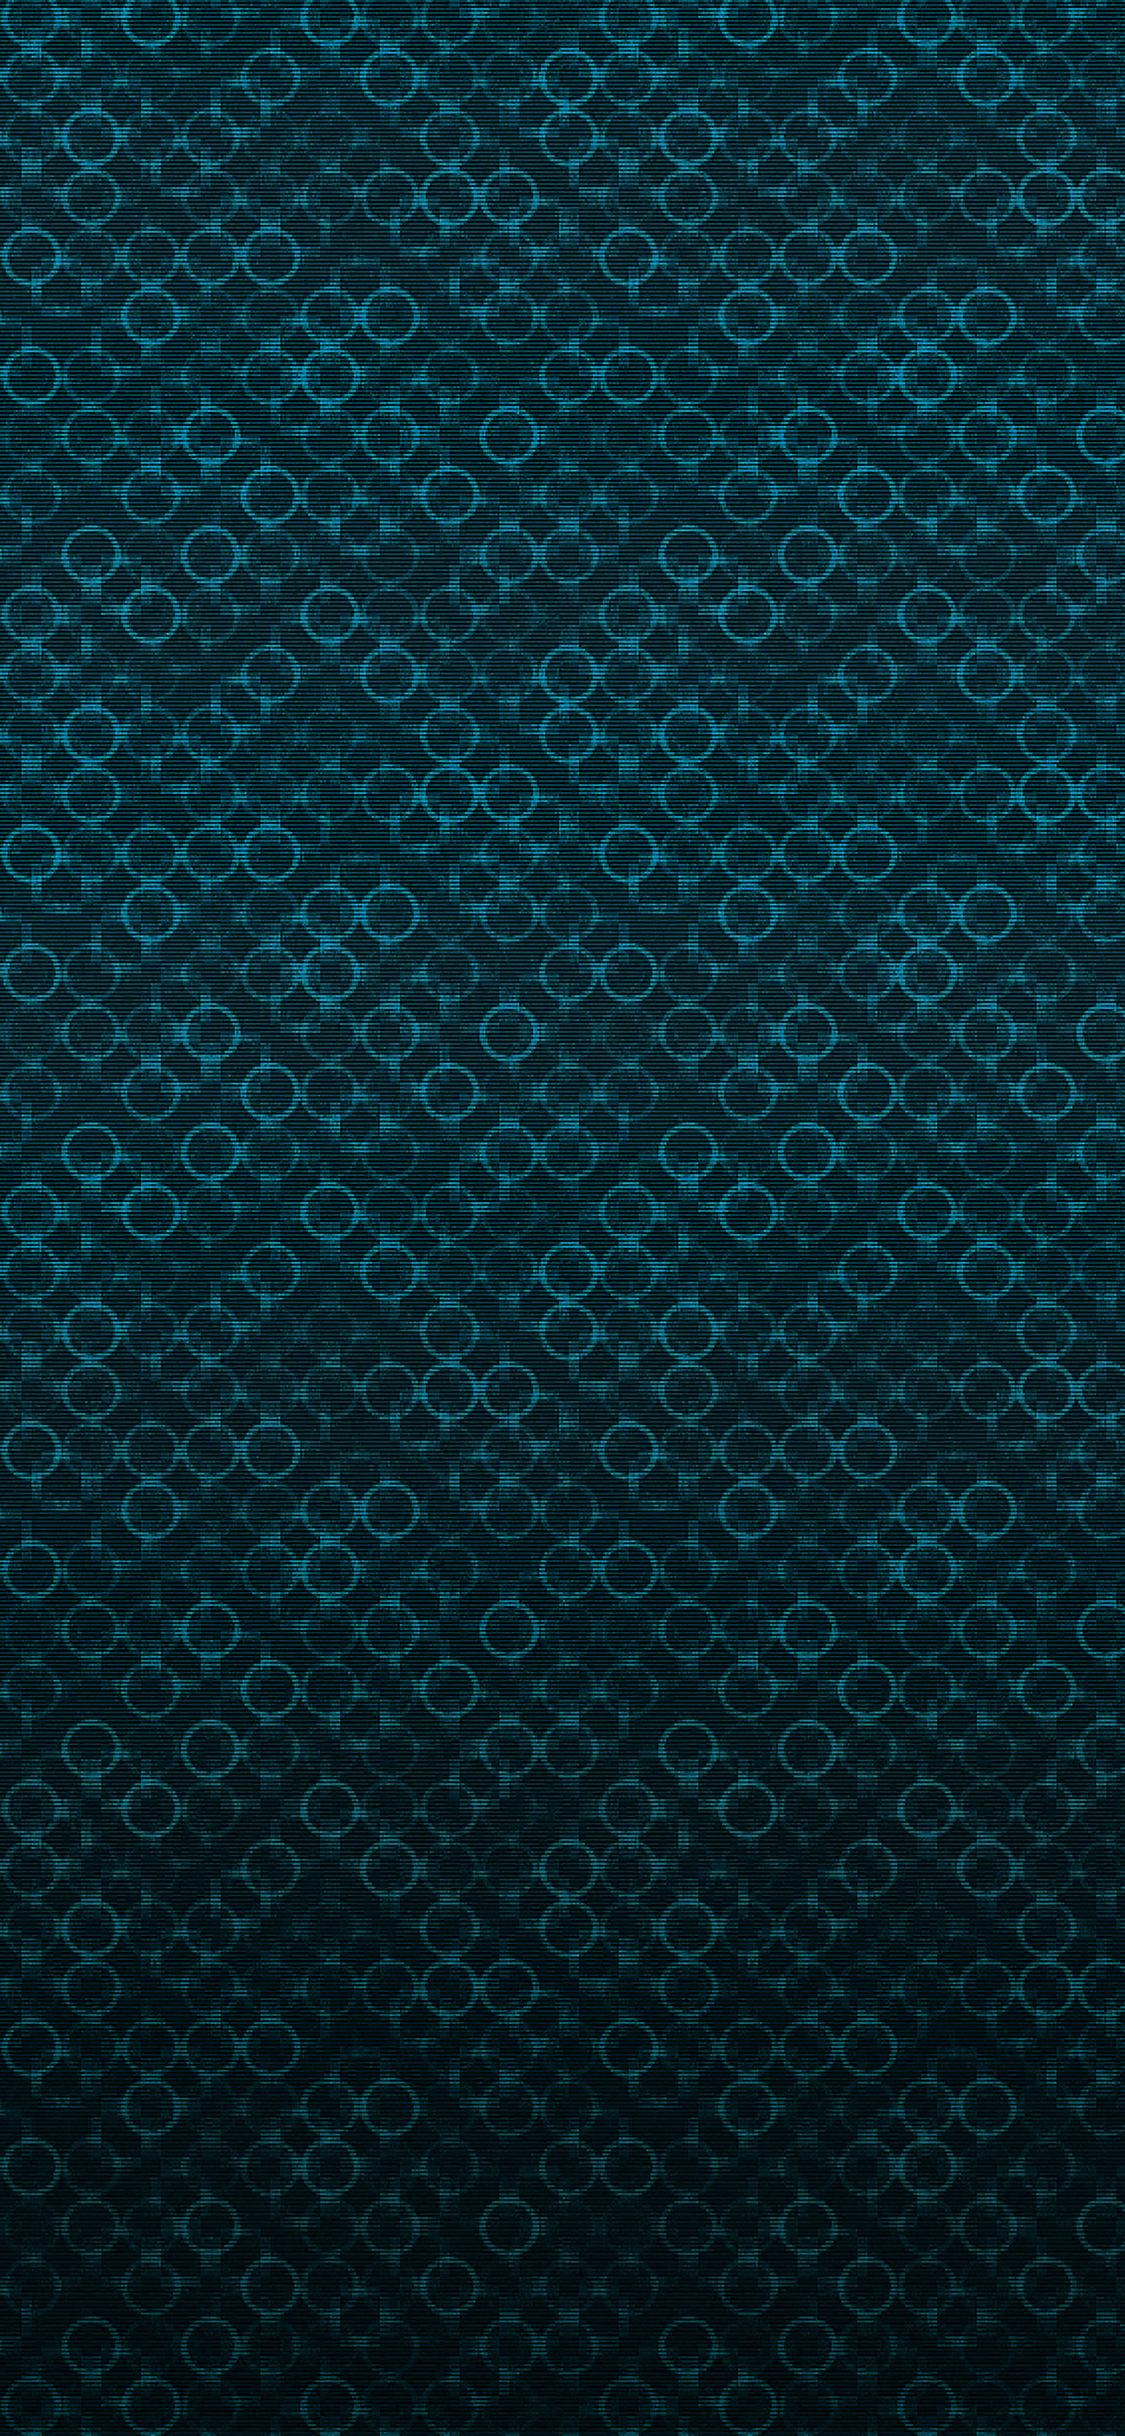 Strange dark blue pattern iPhone X wallpaper